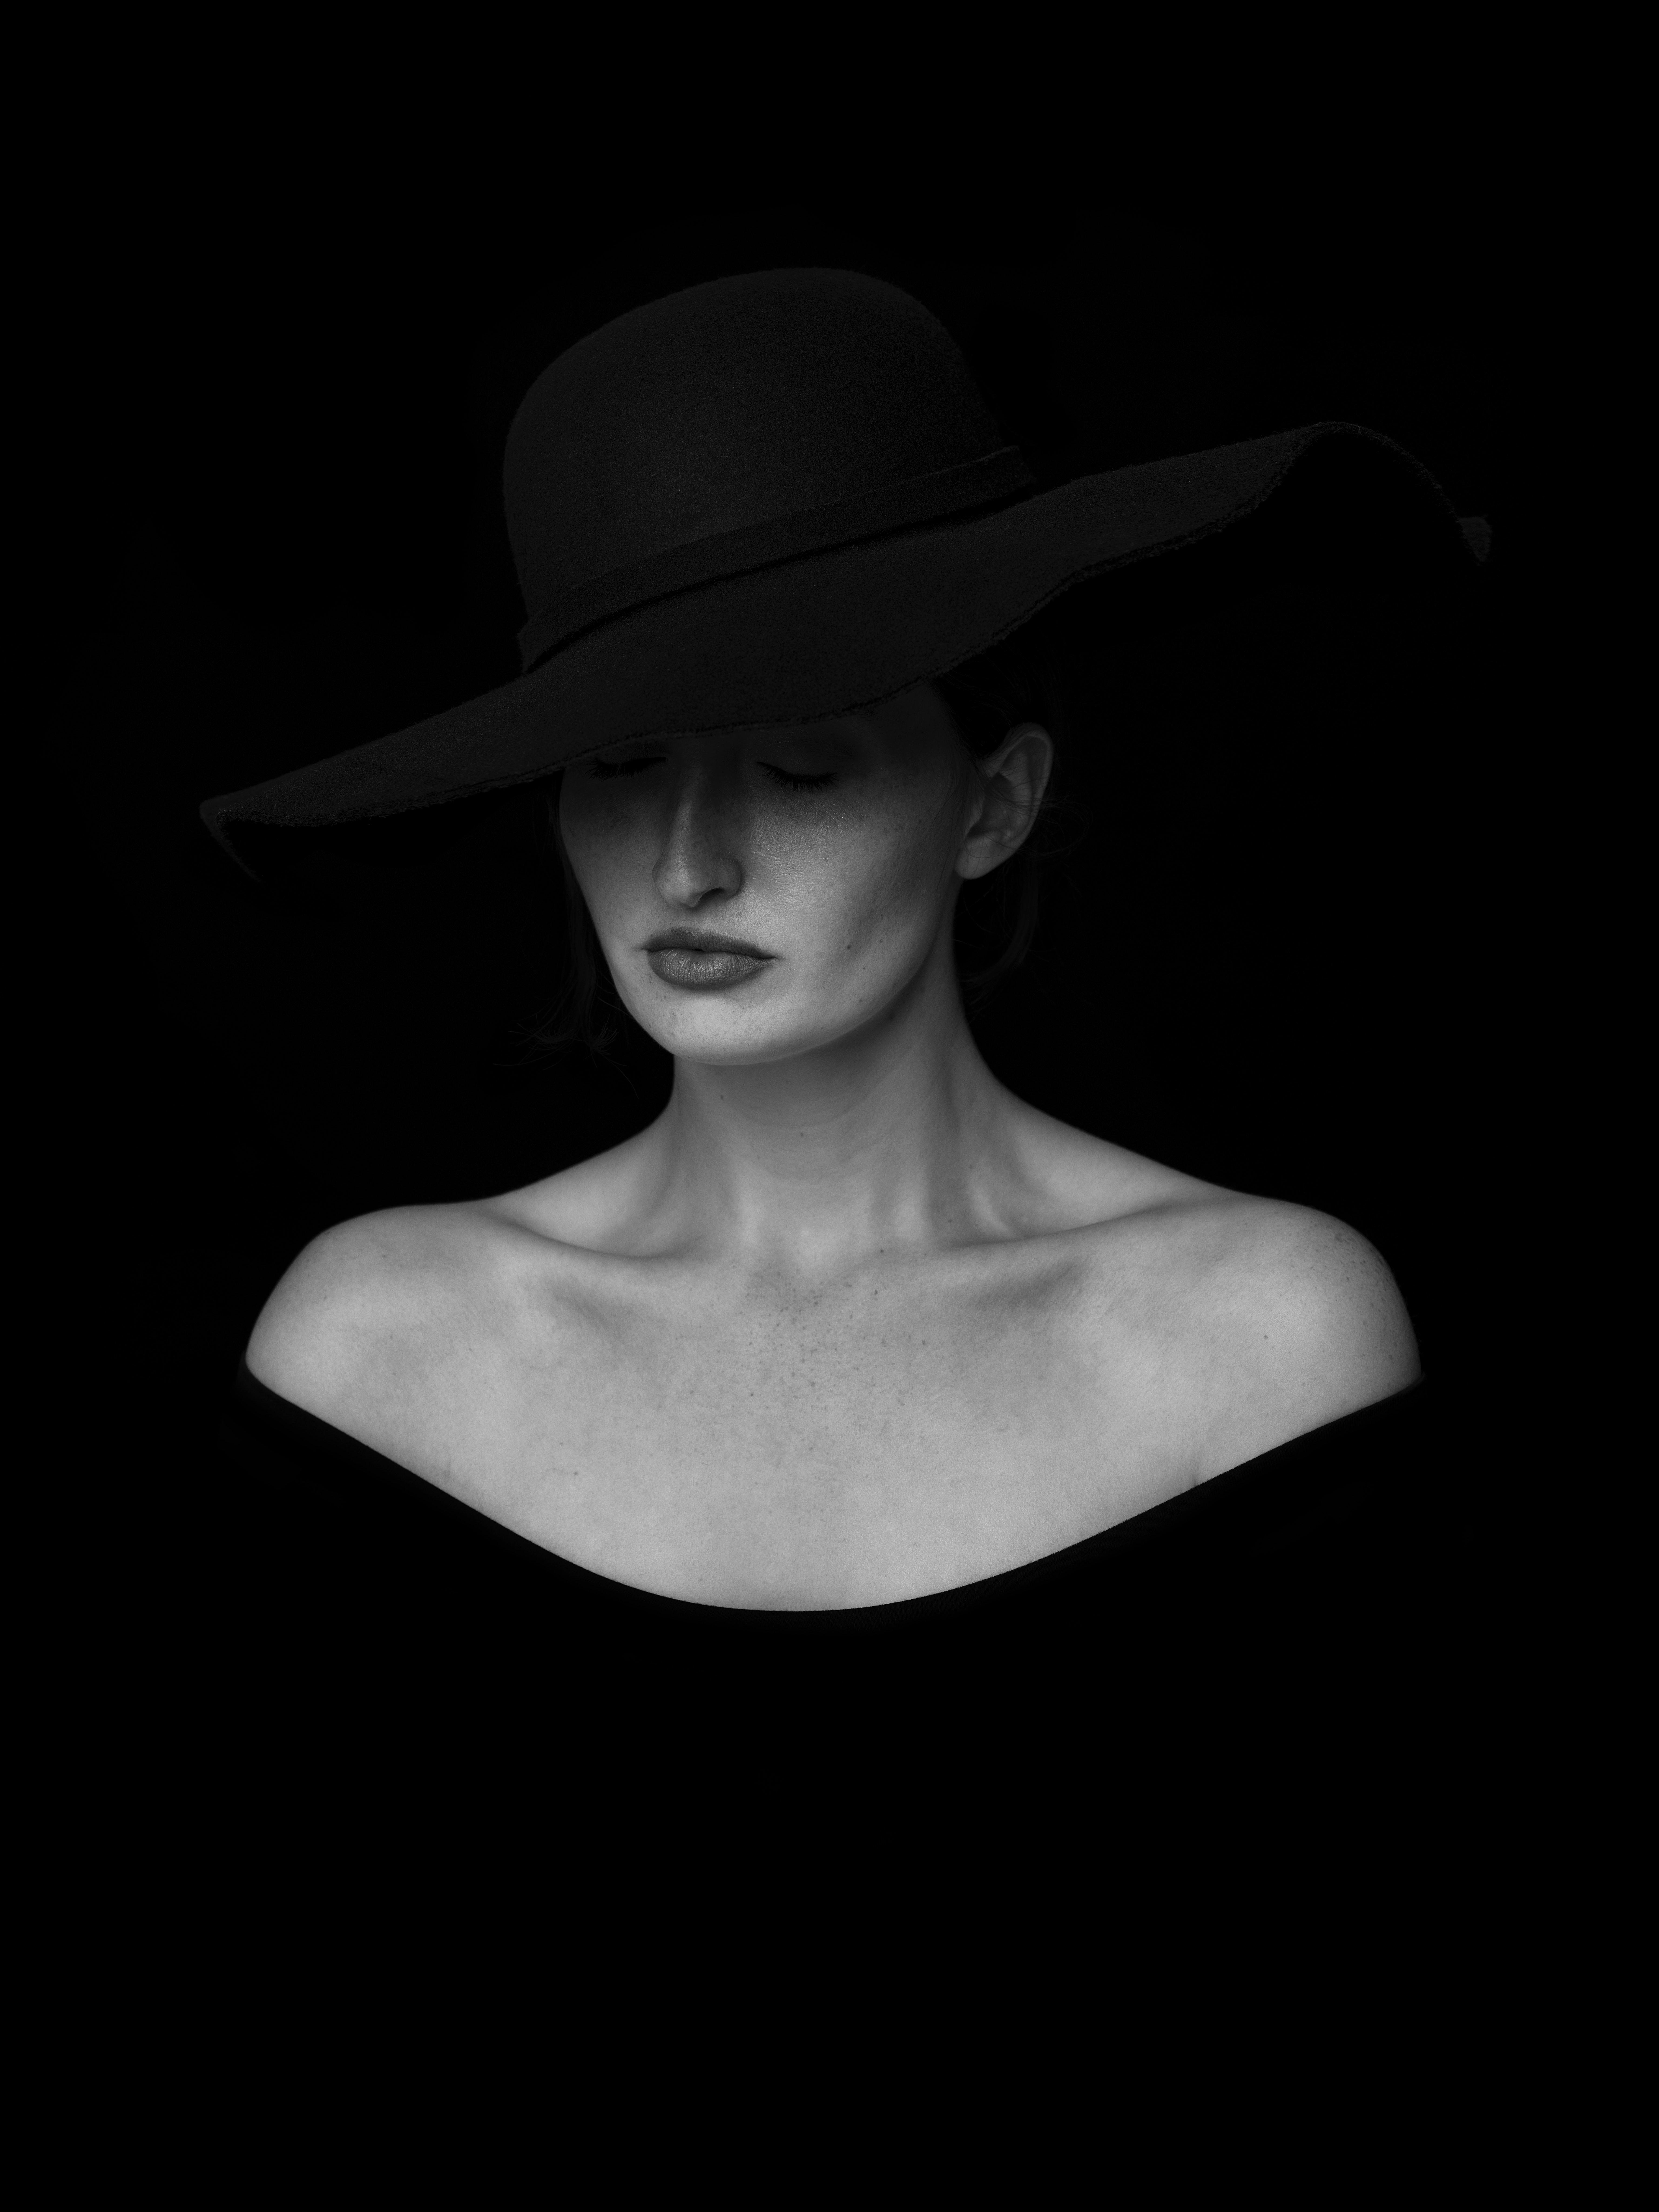 Stylish woman in black